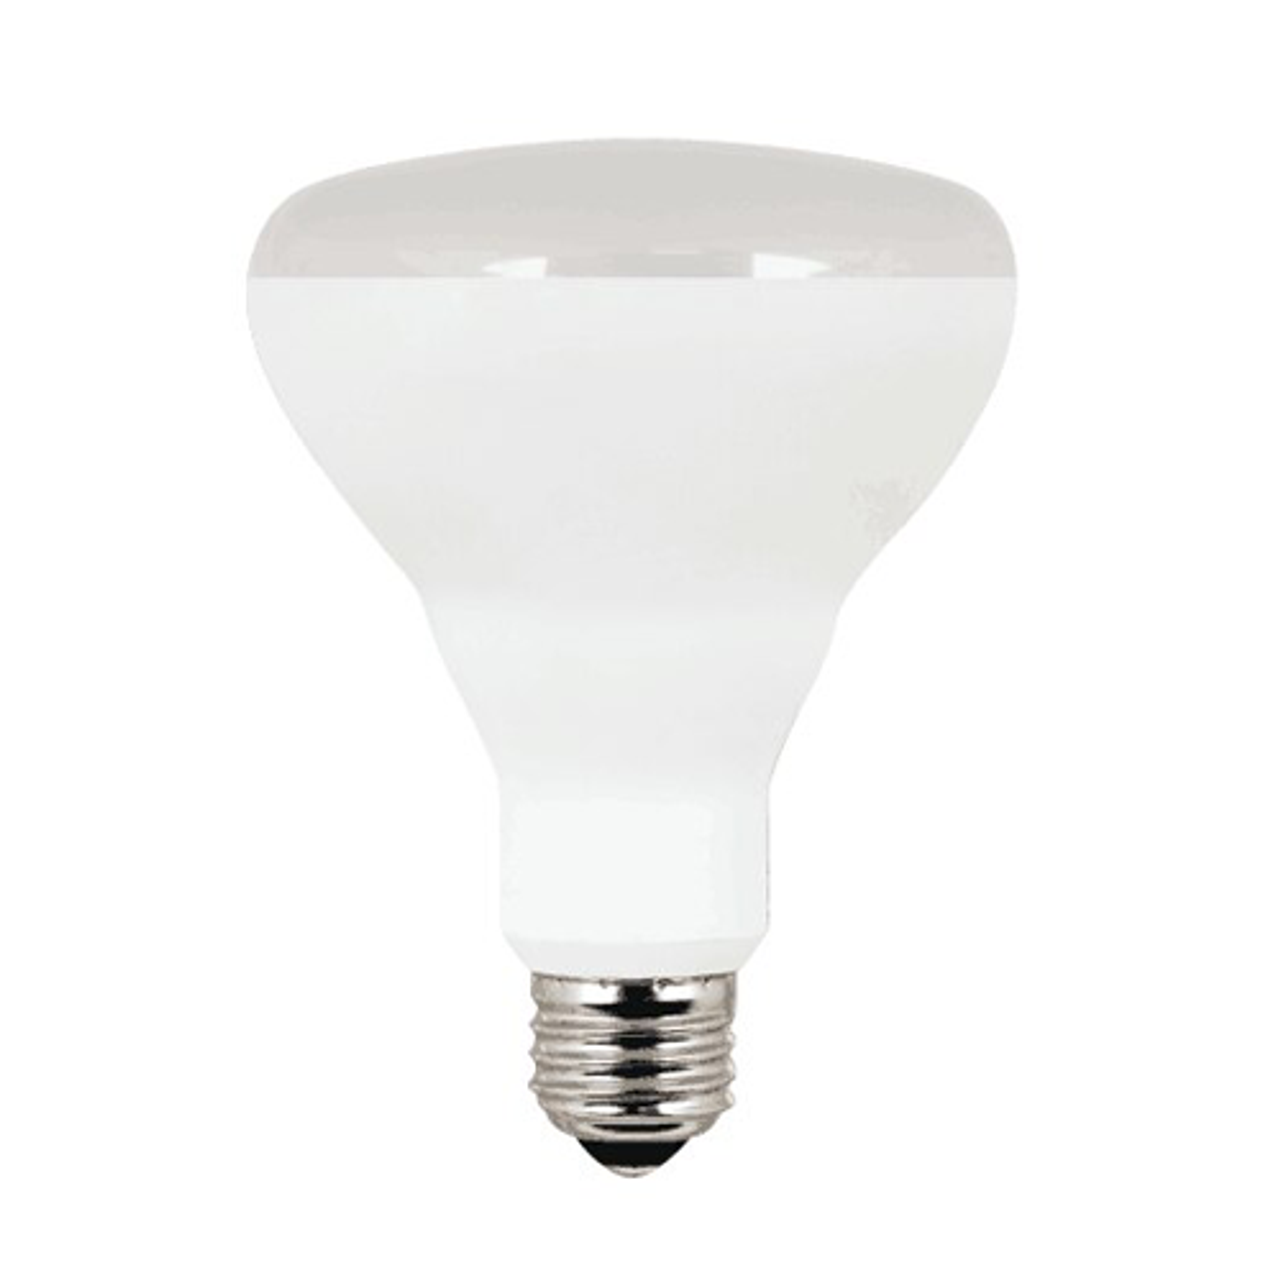 LED BR30 Bulb, 9 Watt, 650 Lumens, 3000K